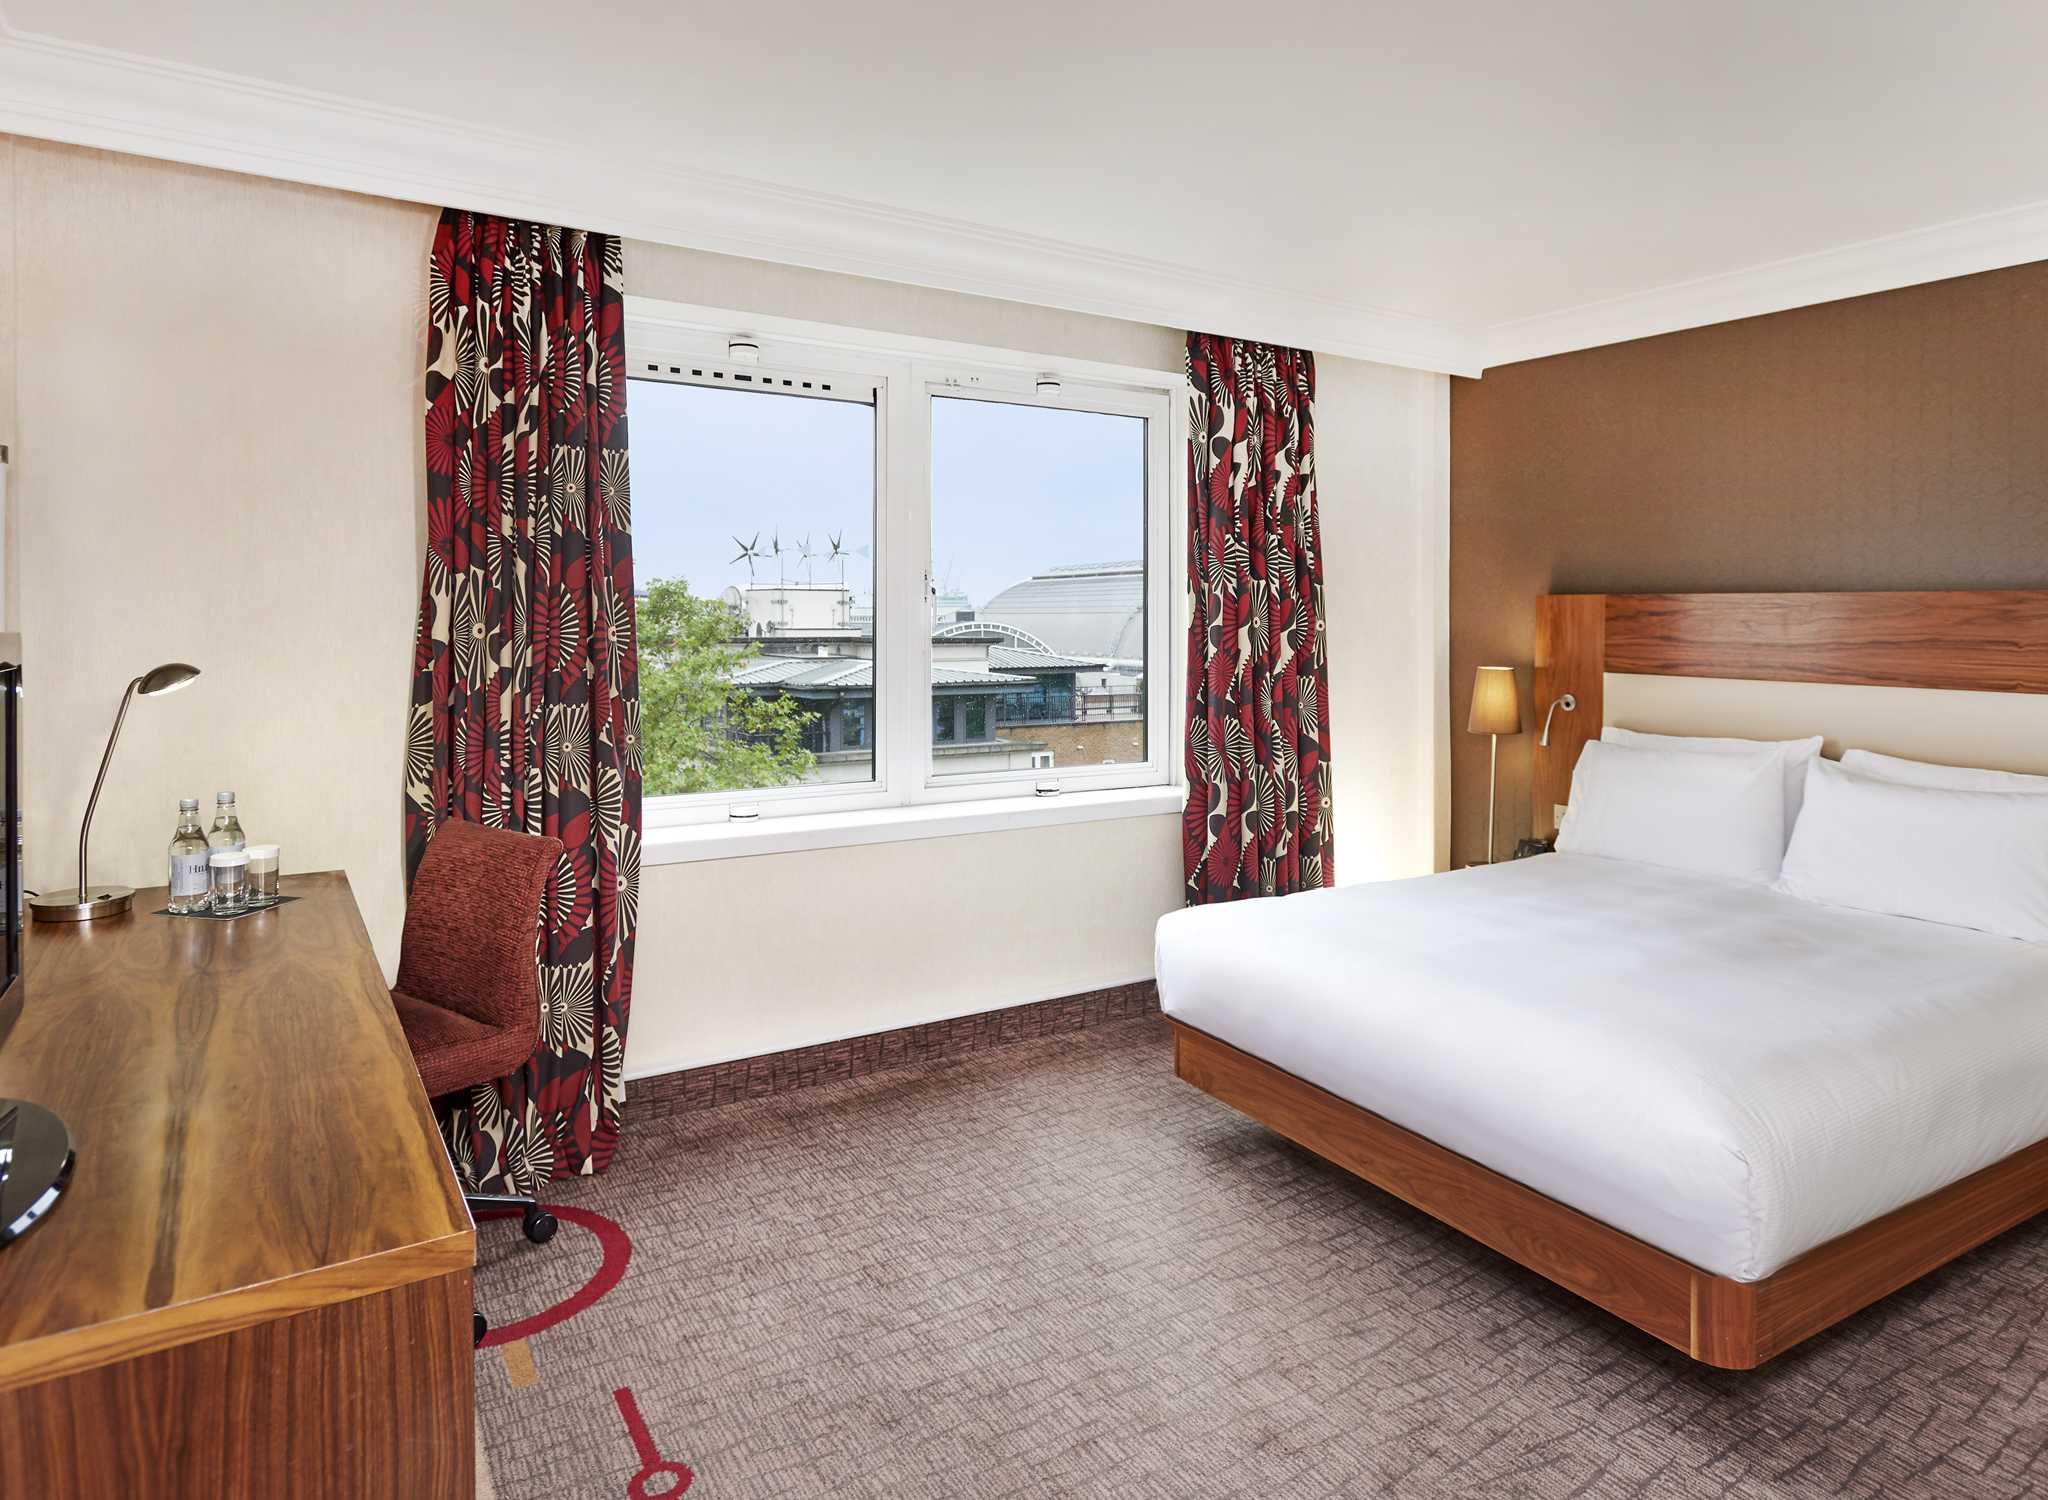 Hilton London Olympia Hotels Kensington Palace London